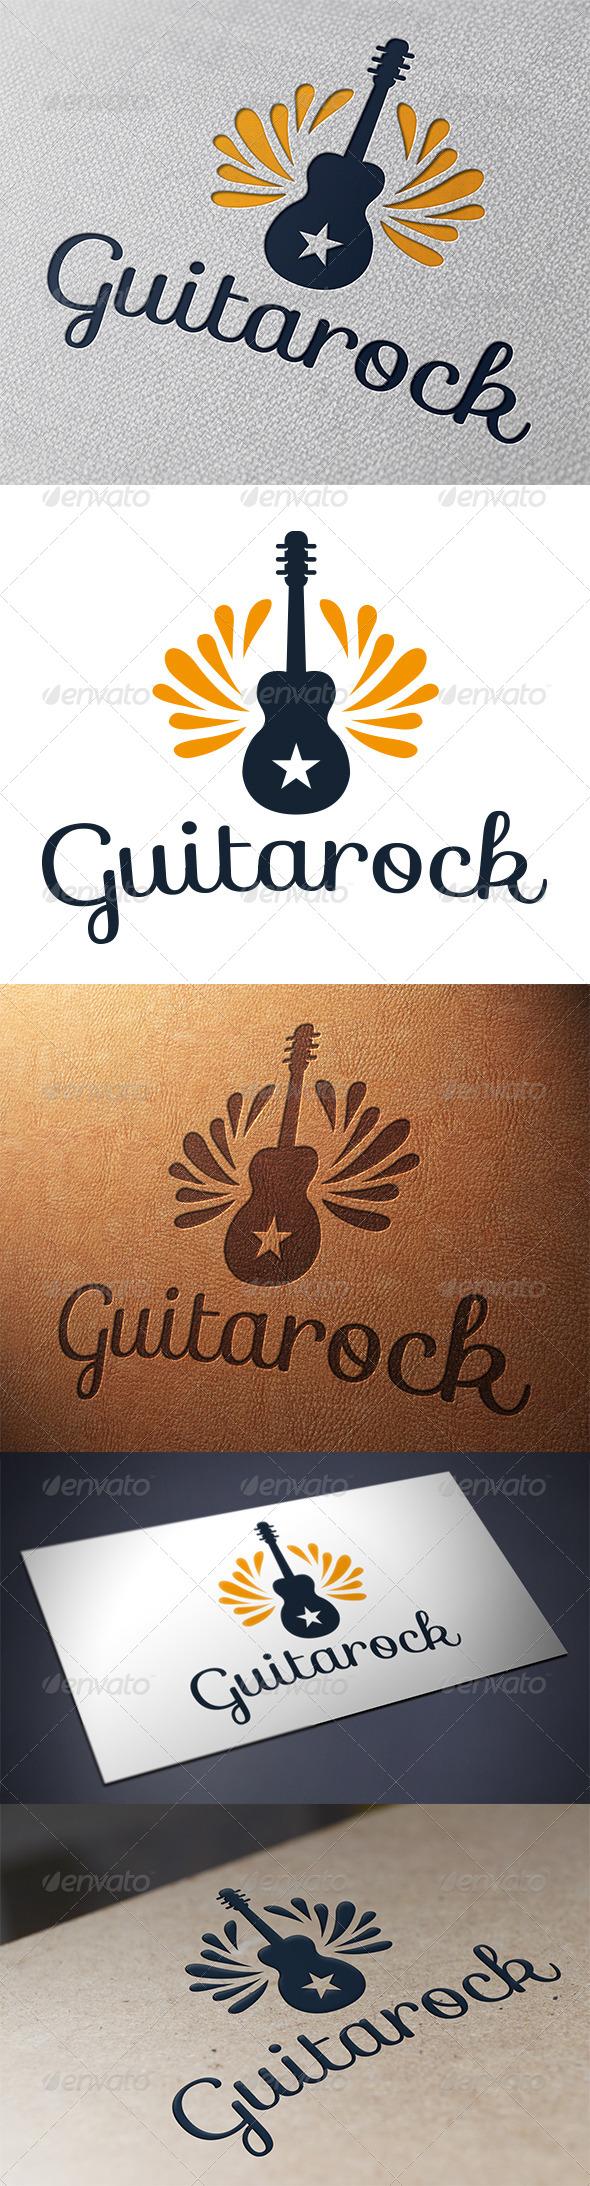 GraphicRiver Guitar Rock Logo Template 5396727